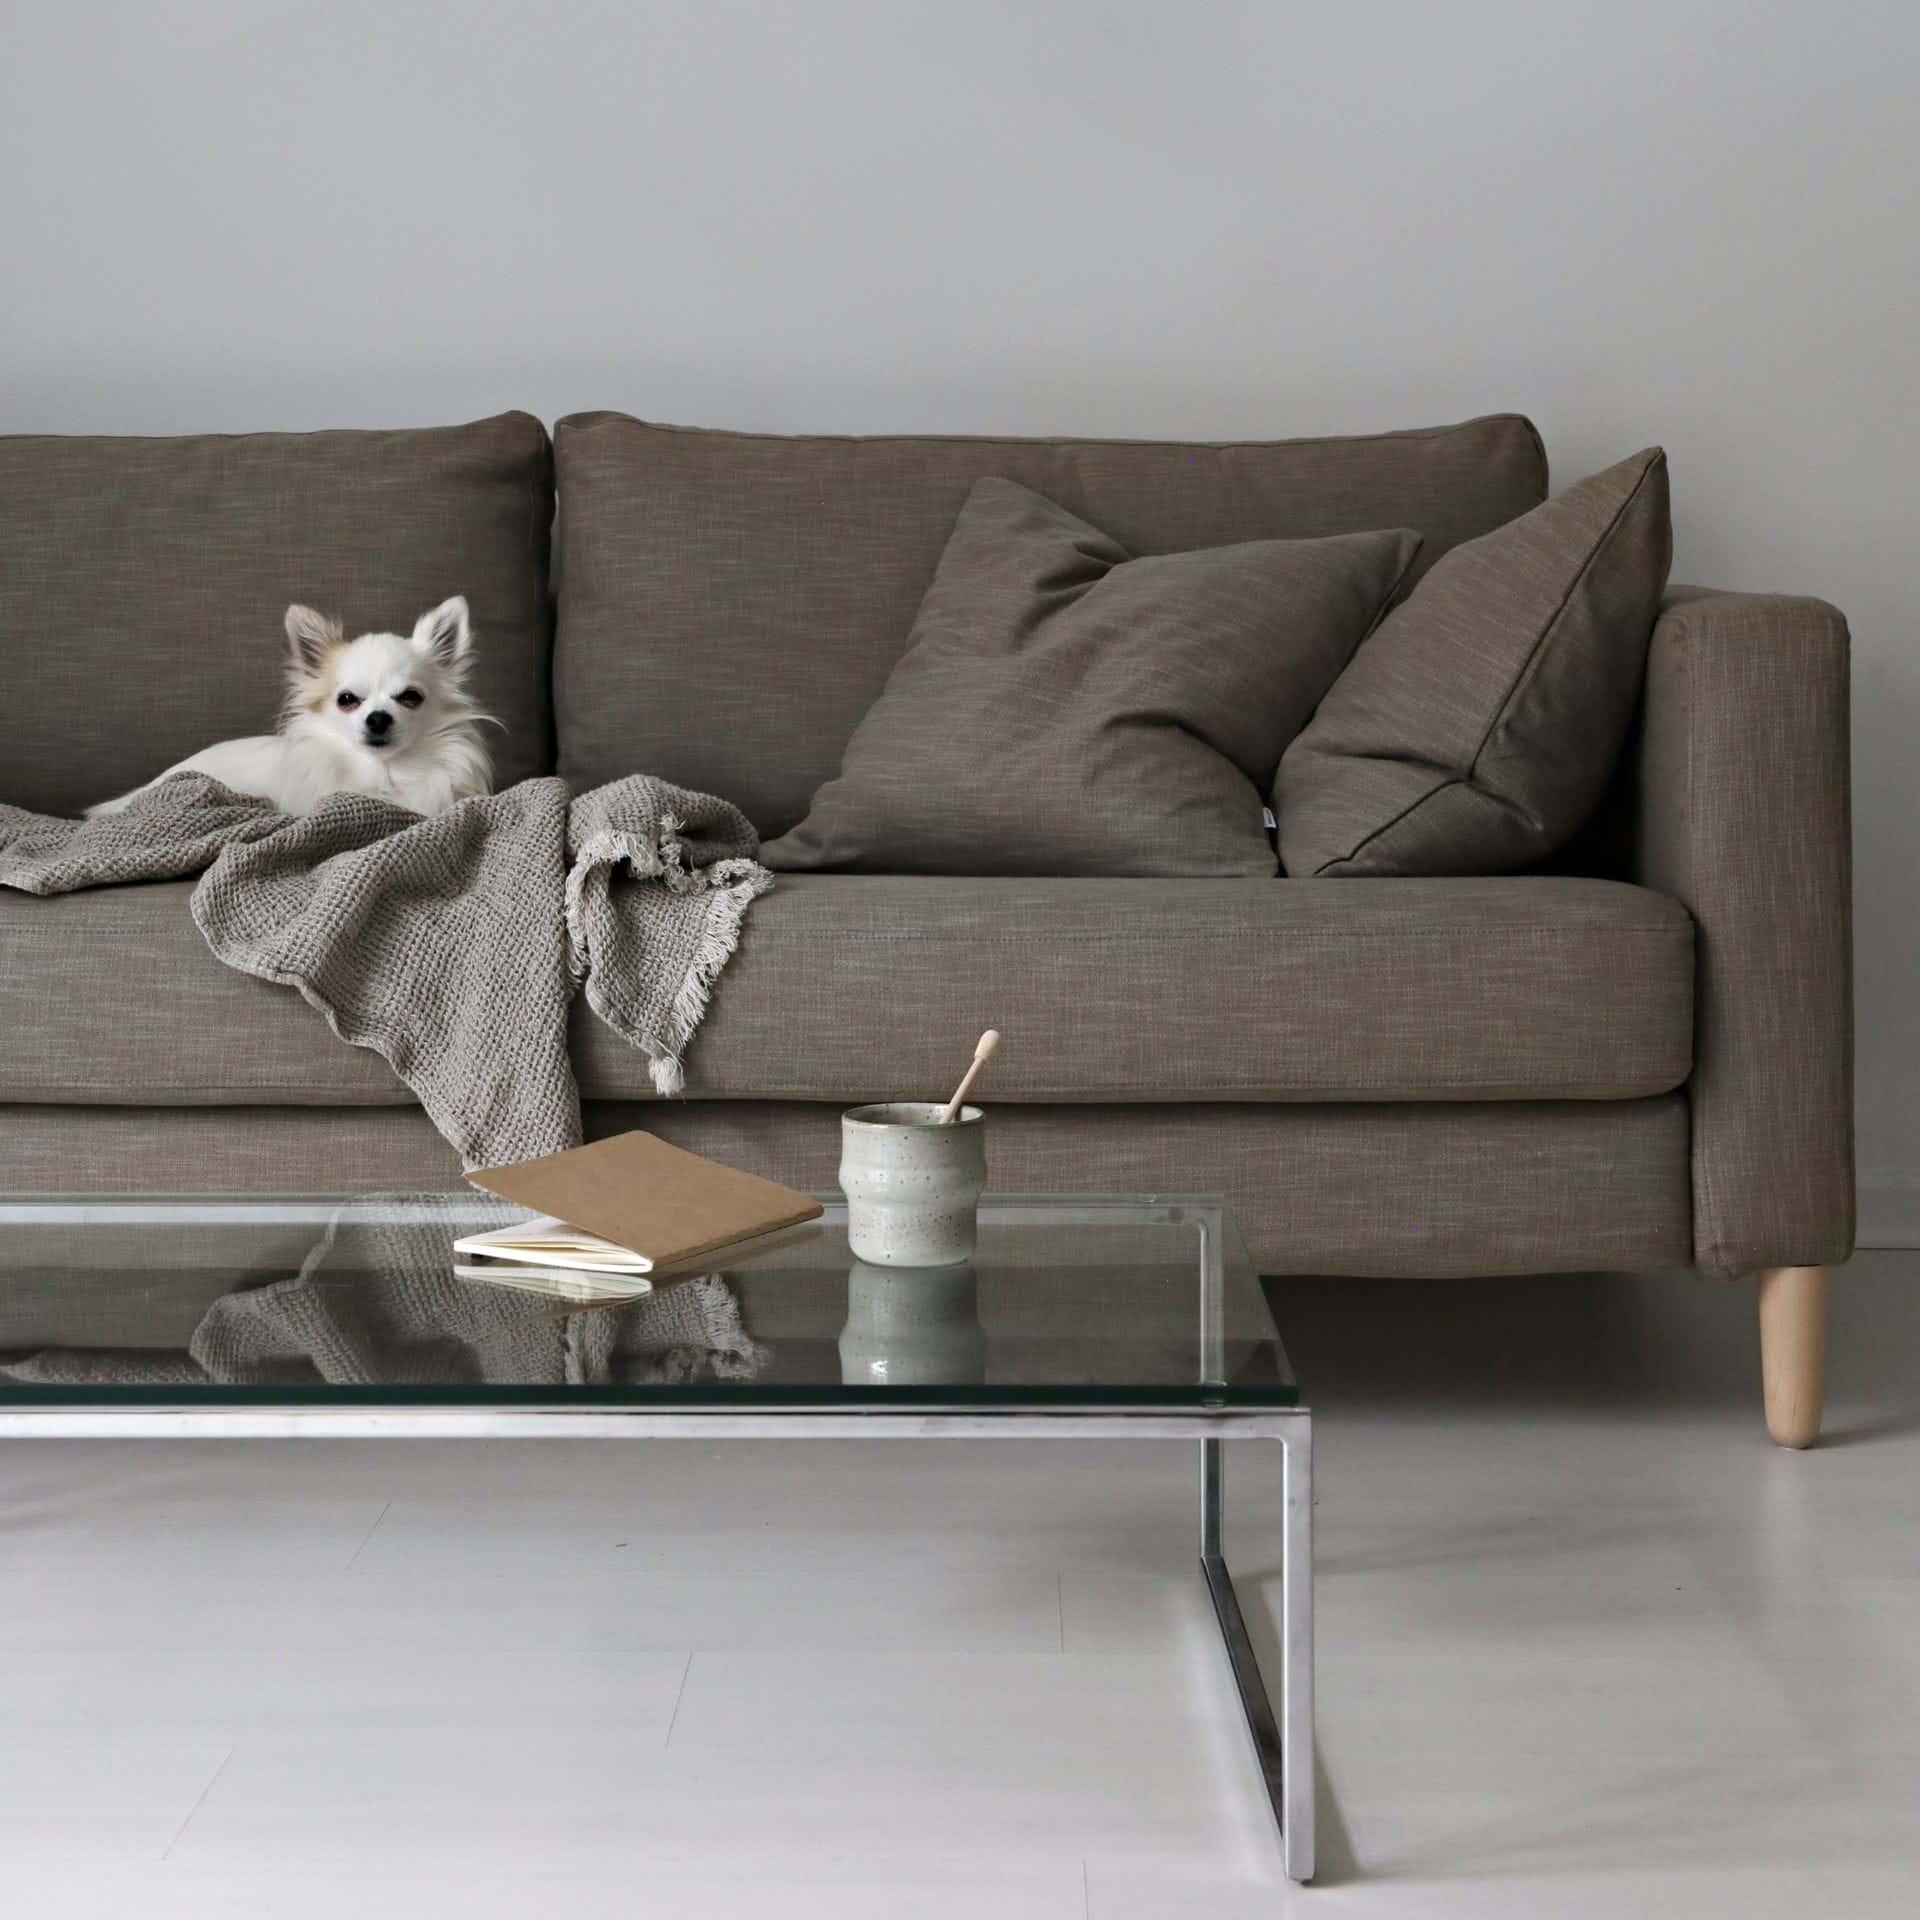 Ikea Karlstad 2 Seater Sofa Cover